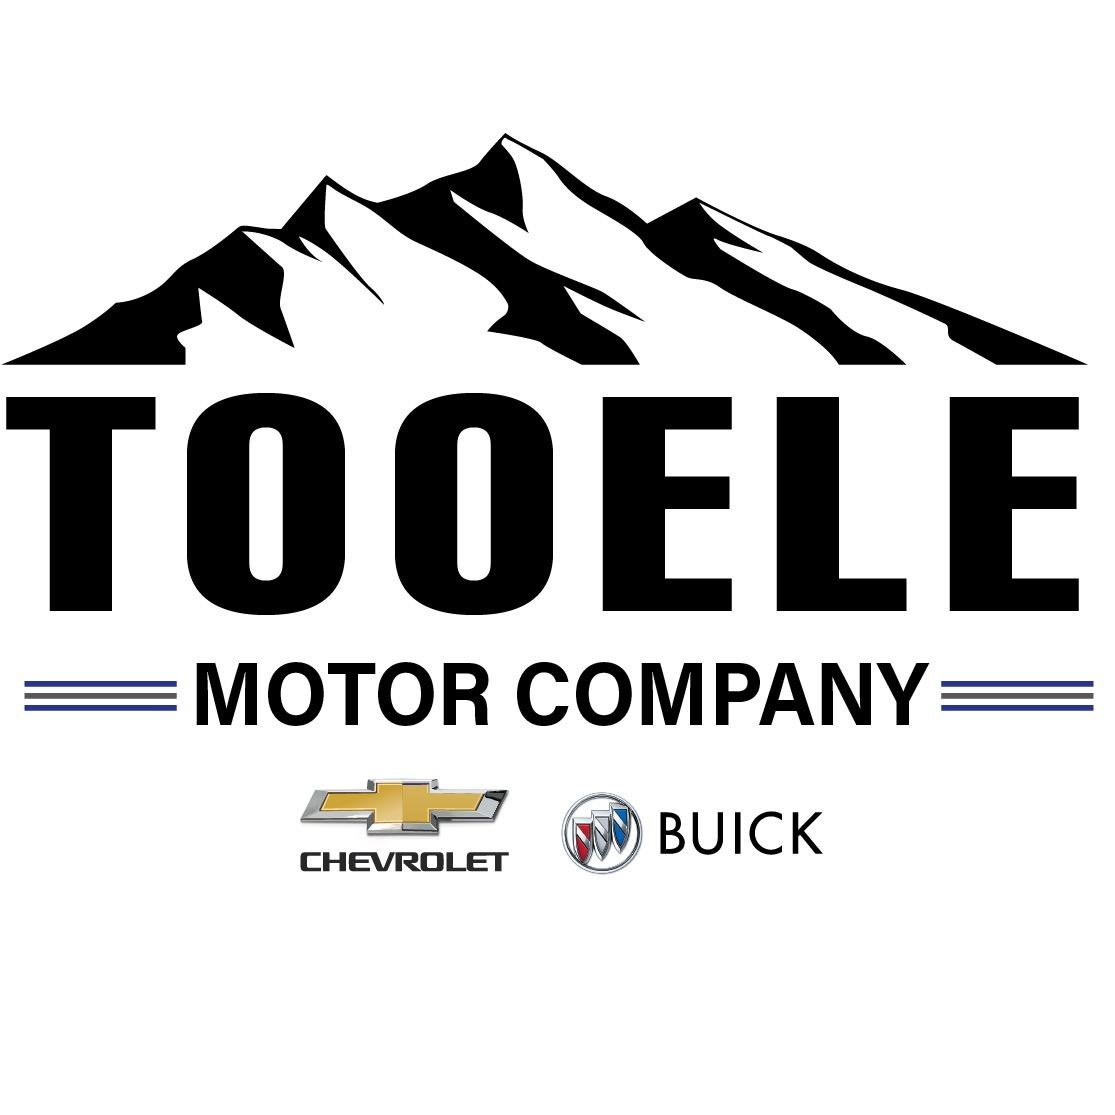 Tooele Chevrolet Buick - Tooele, UT 84074 - (435)228-4868 | ShowMeLocal.com